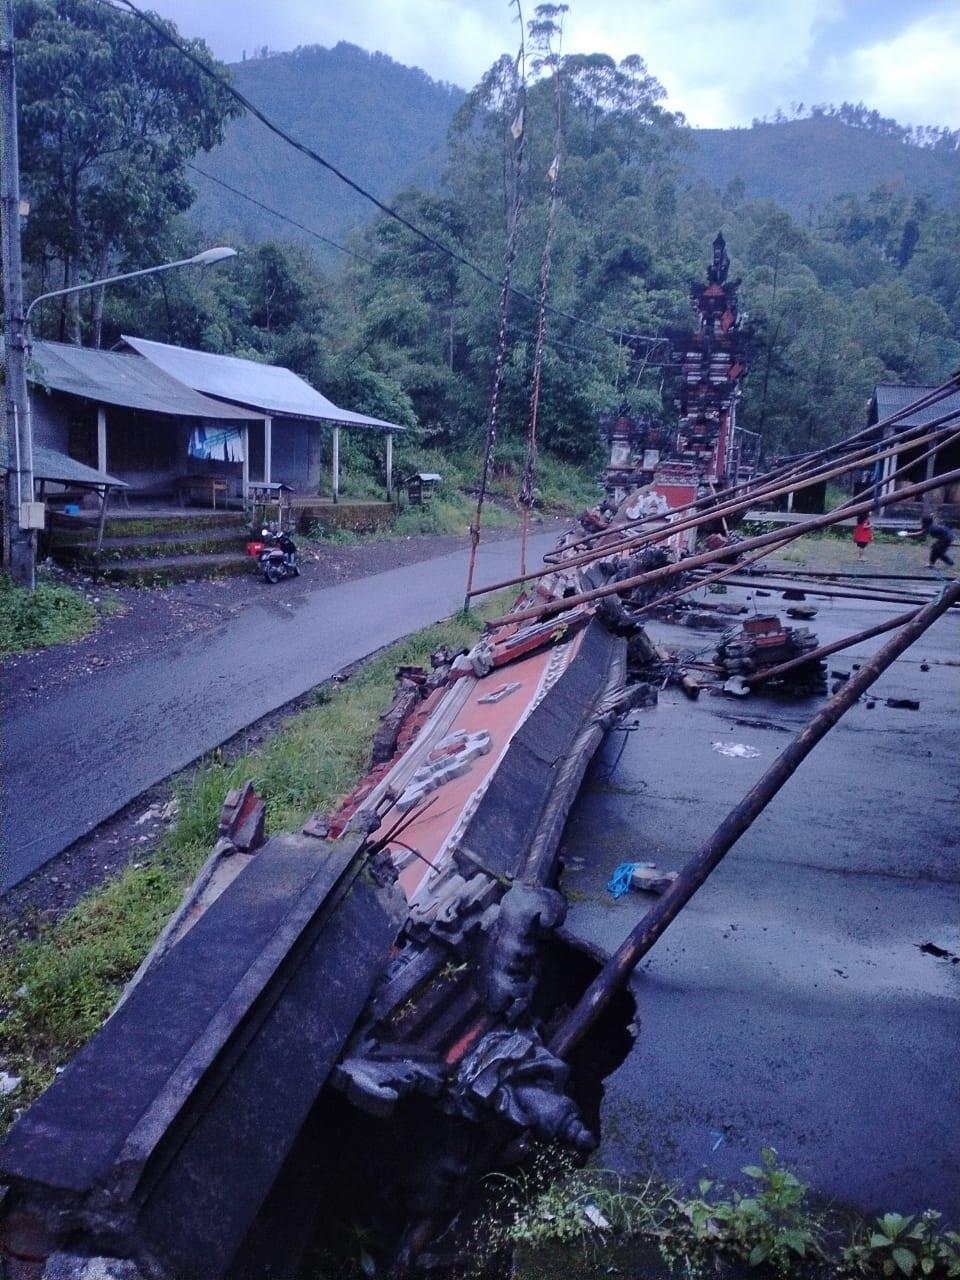 KONDISI tembok panyengker Pura Dukuh Sakti Petapan di Banjar Dinas Daya, Desa Ban, Kecamatan Kubu, Karangasem, yang jebol. Foto: nad